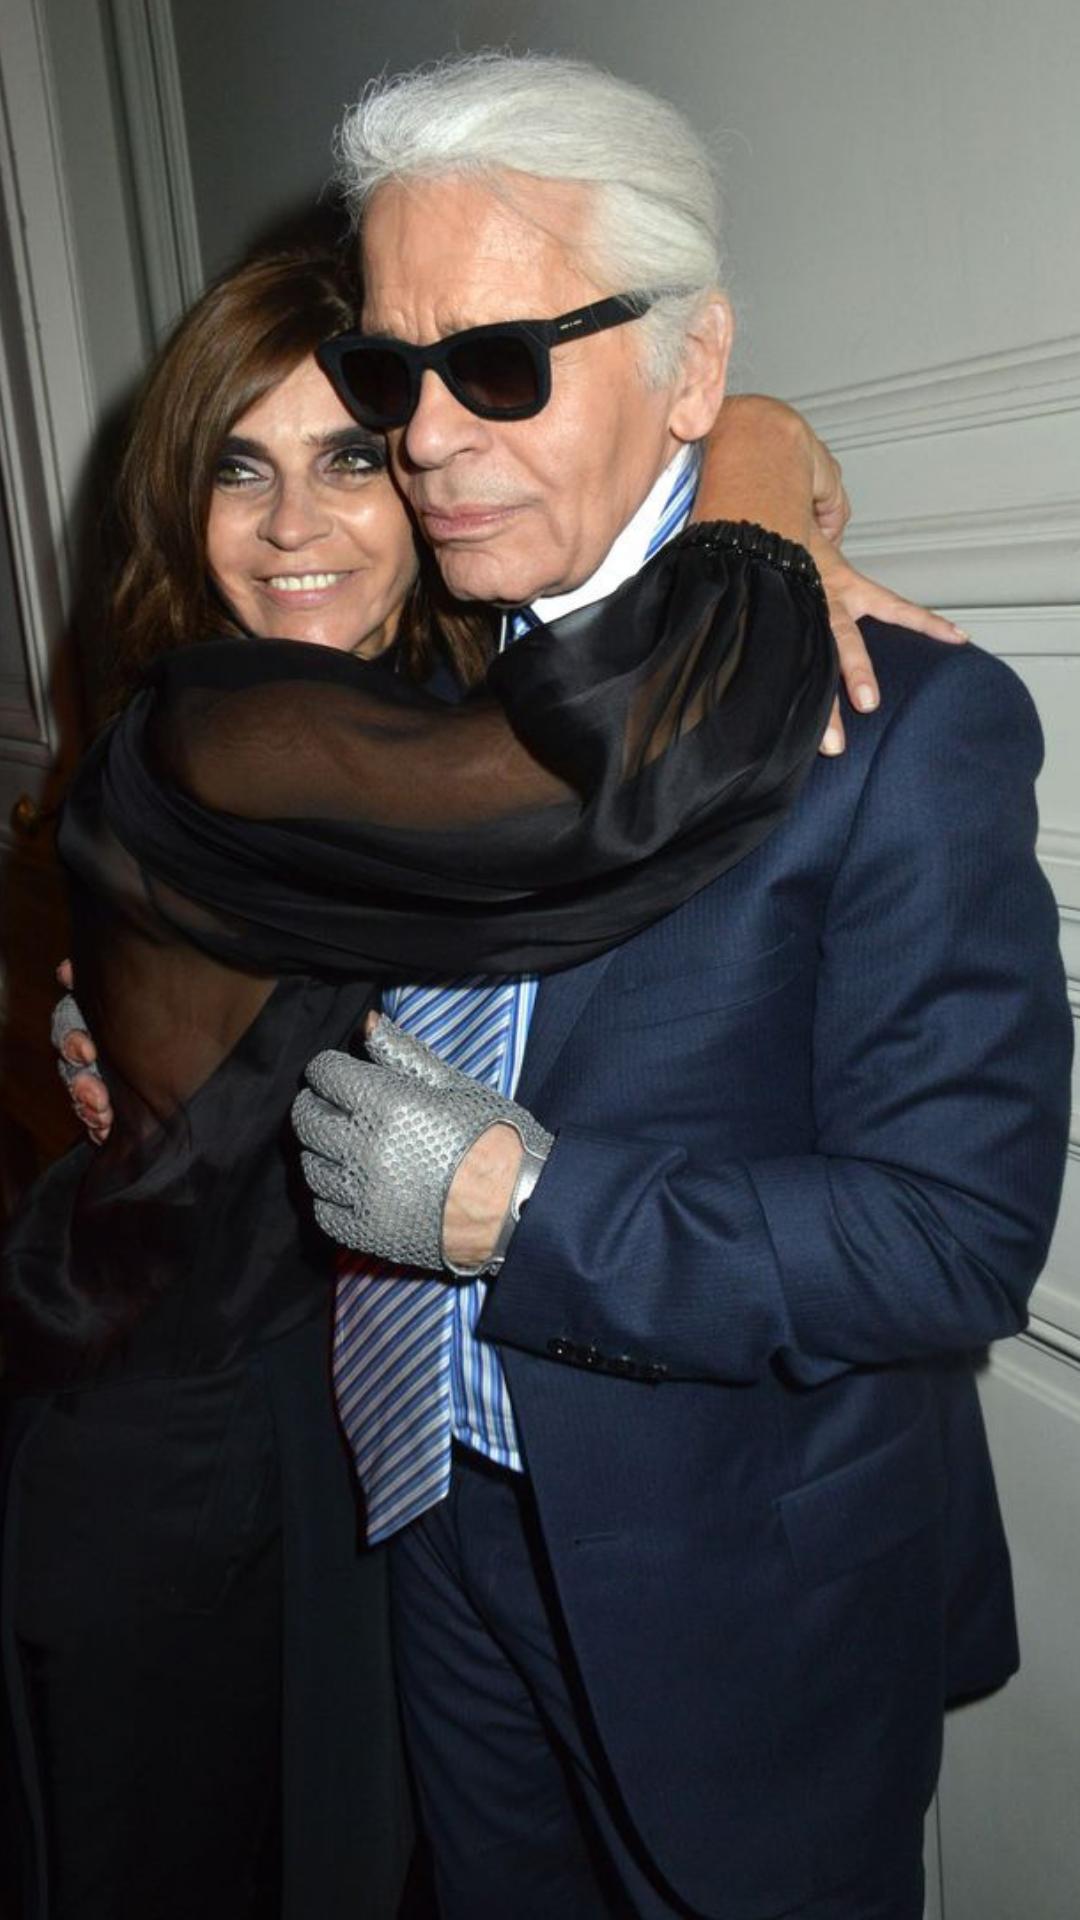 Carine Roitfeld and Karl Lagerfeld